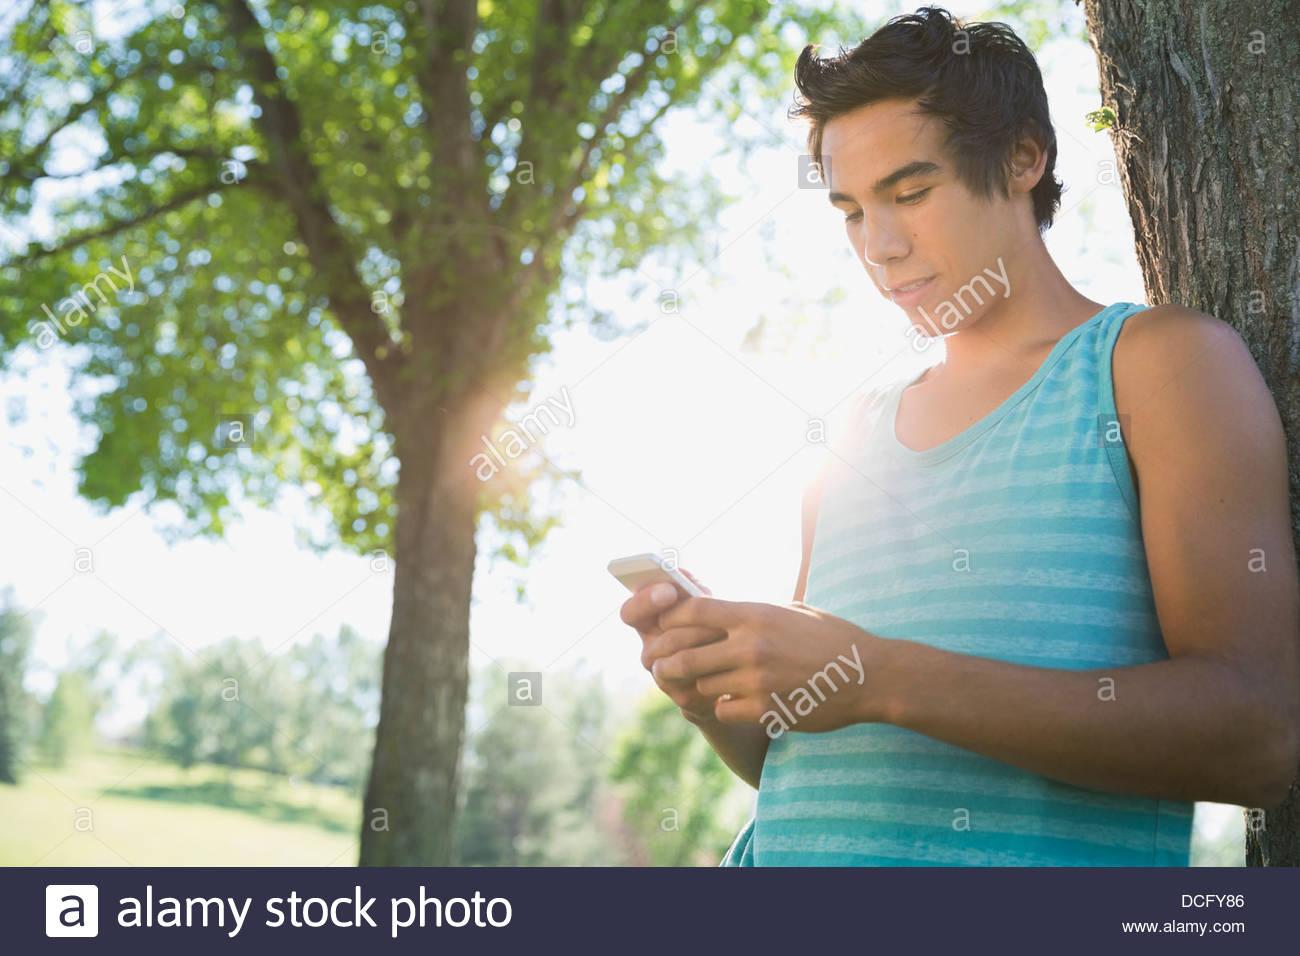 Teenager using smart phone - Stock Image